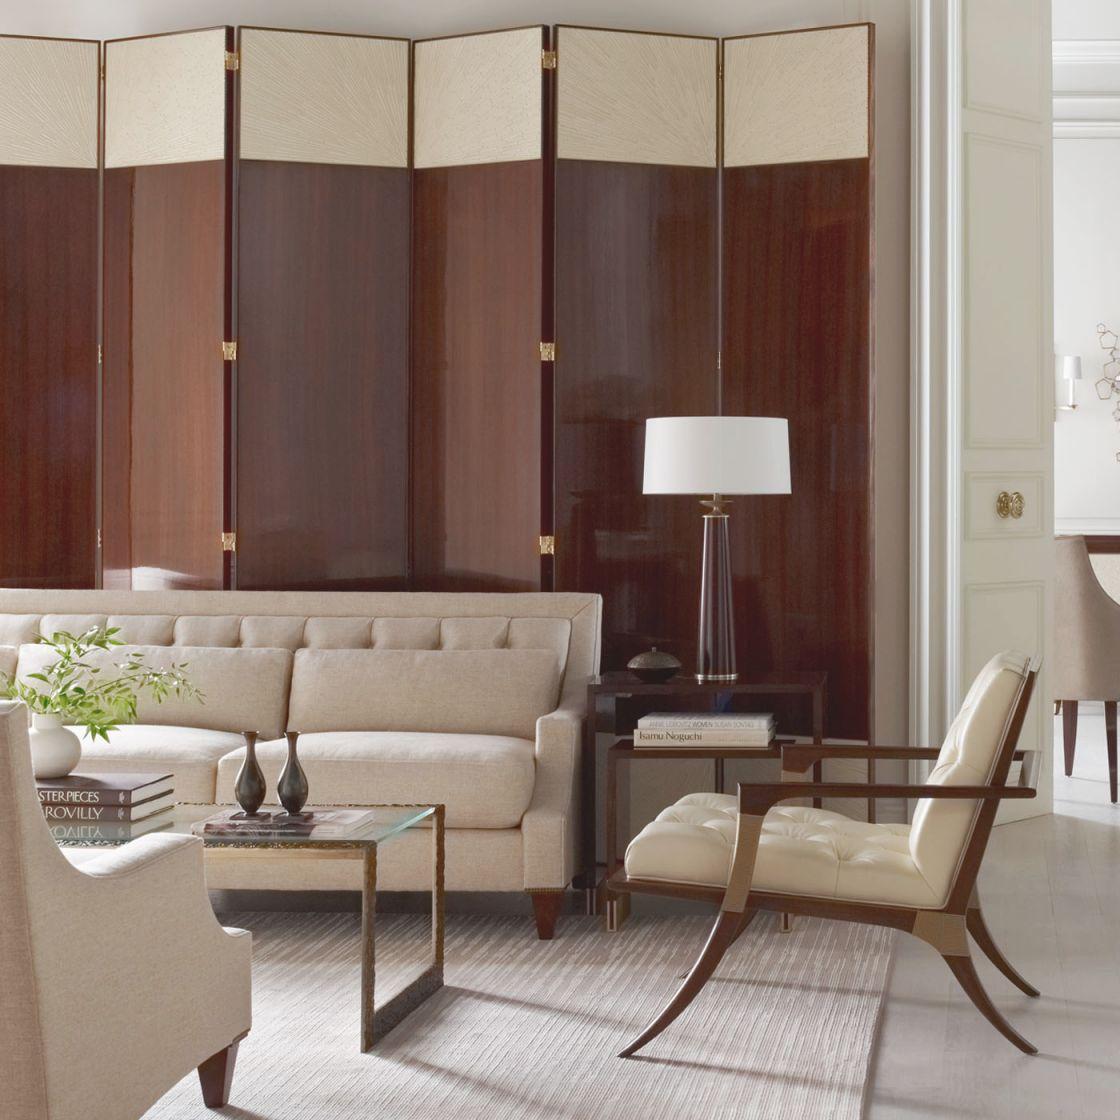 Modern Living Room Furniture & Accessories   Baker Furniture intended for Living Room Furniture Tables